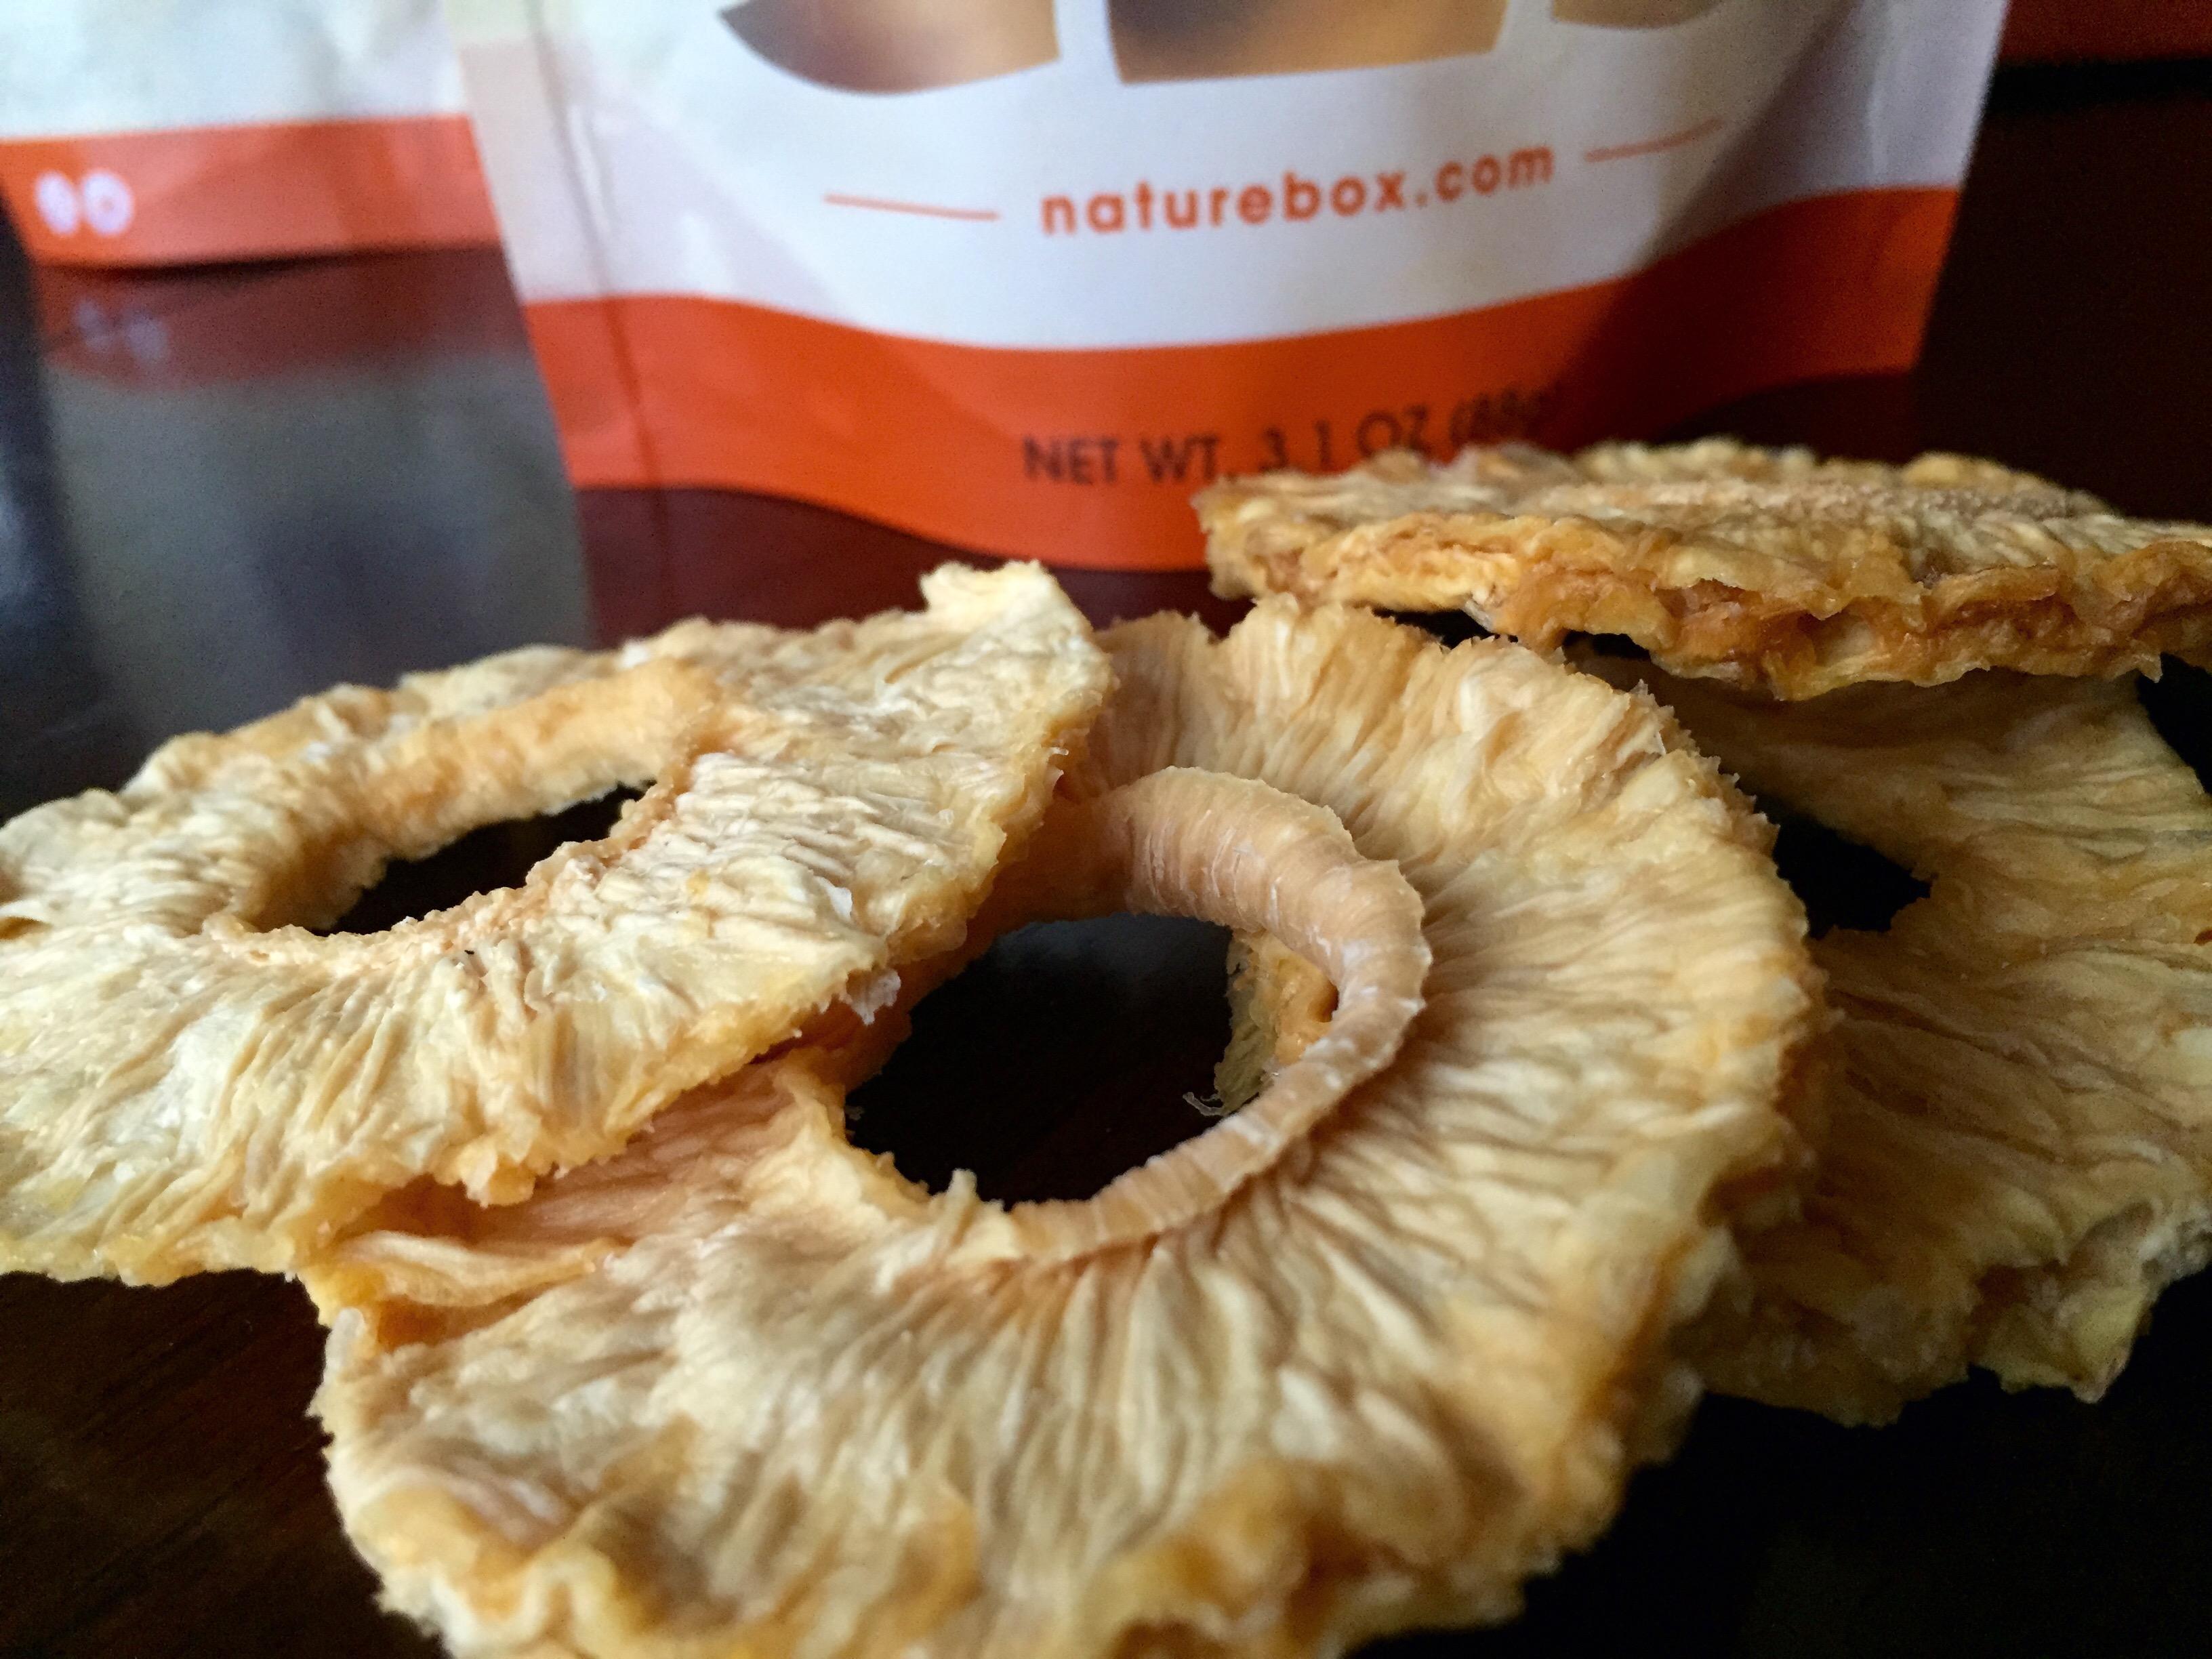 Foodie Friday: My Military Kids Enjoy Snacks from NatureBox